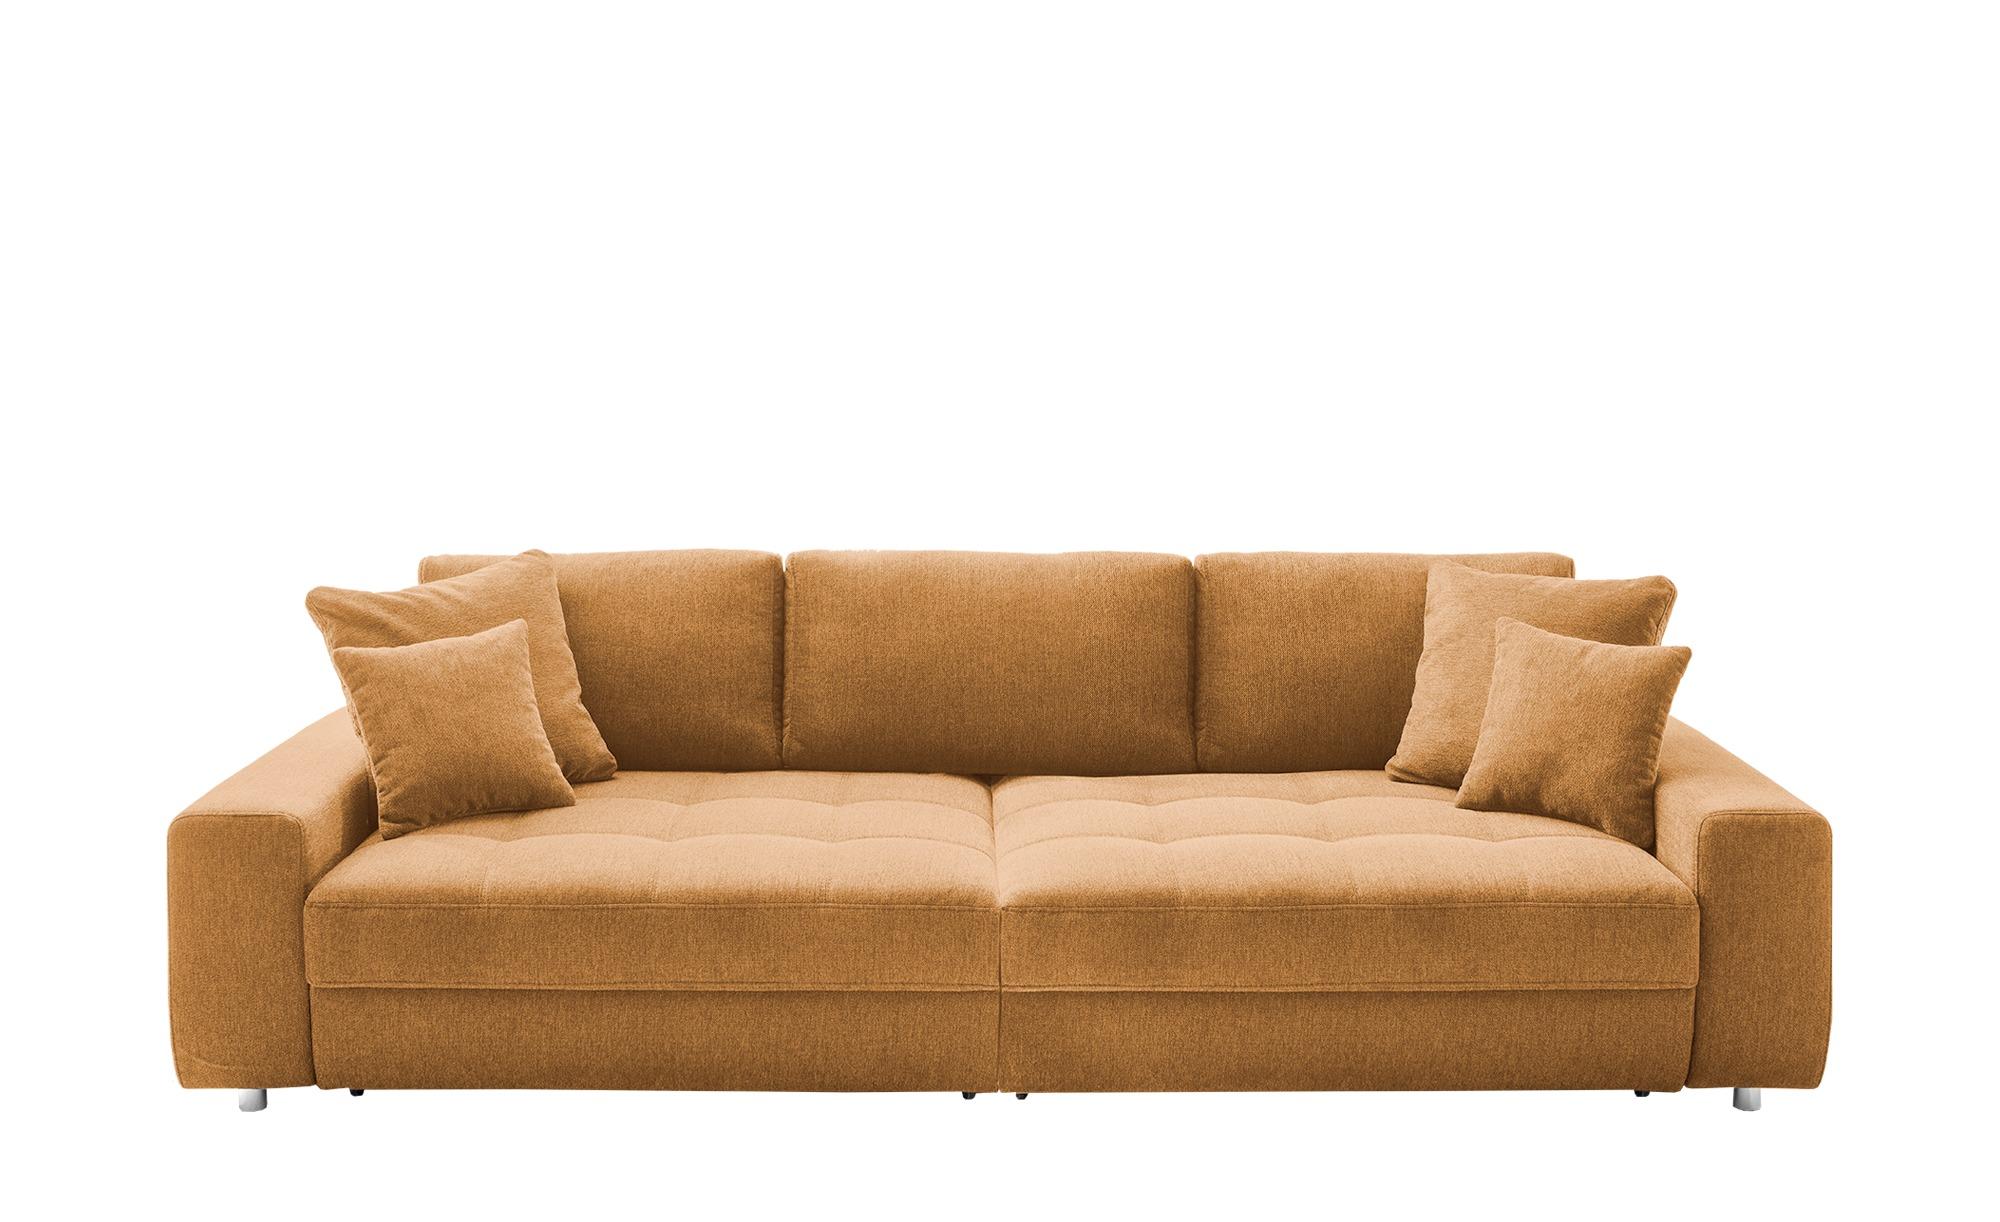 bobb Big Sofa  Arissa de Luxe ¦ gelb ¦ Maße (cm): B: 292 H: 84 T: 120 Polstermöbel > Sofas > Big-Sofas - Höffner